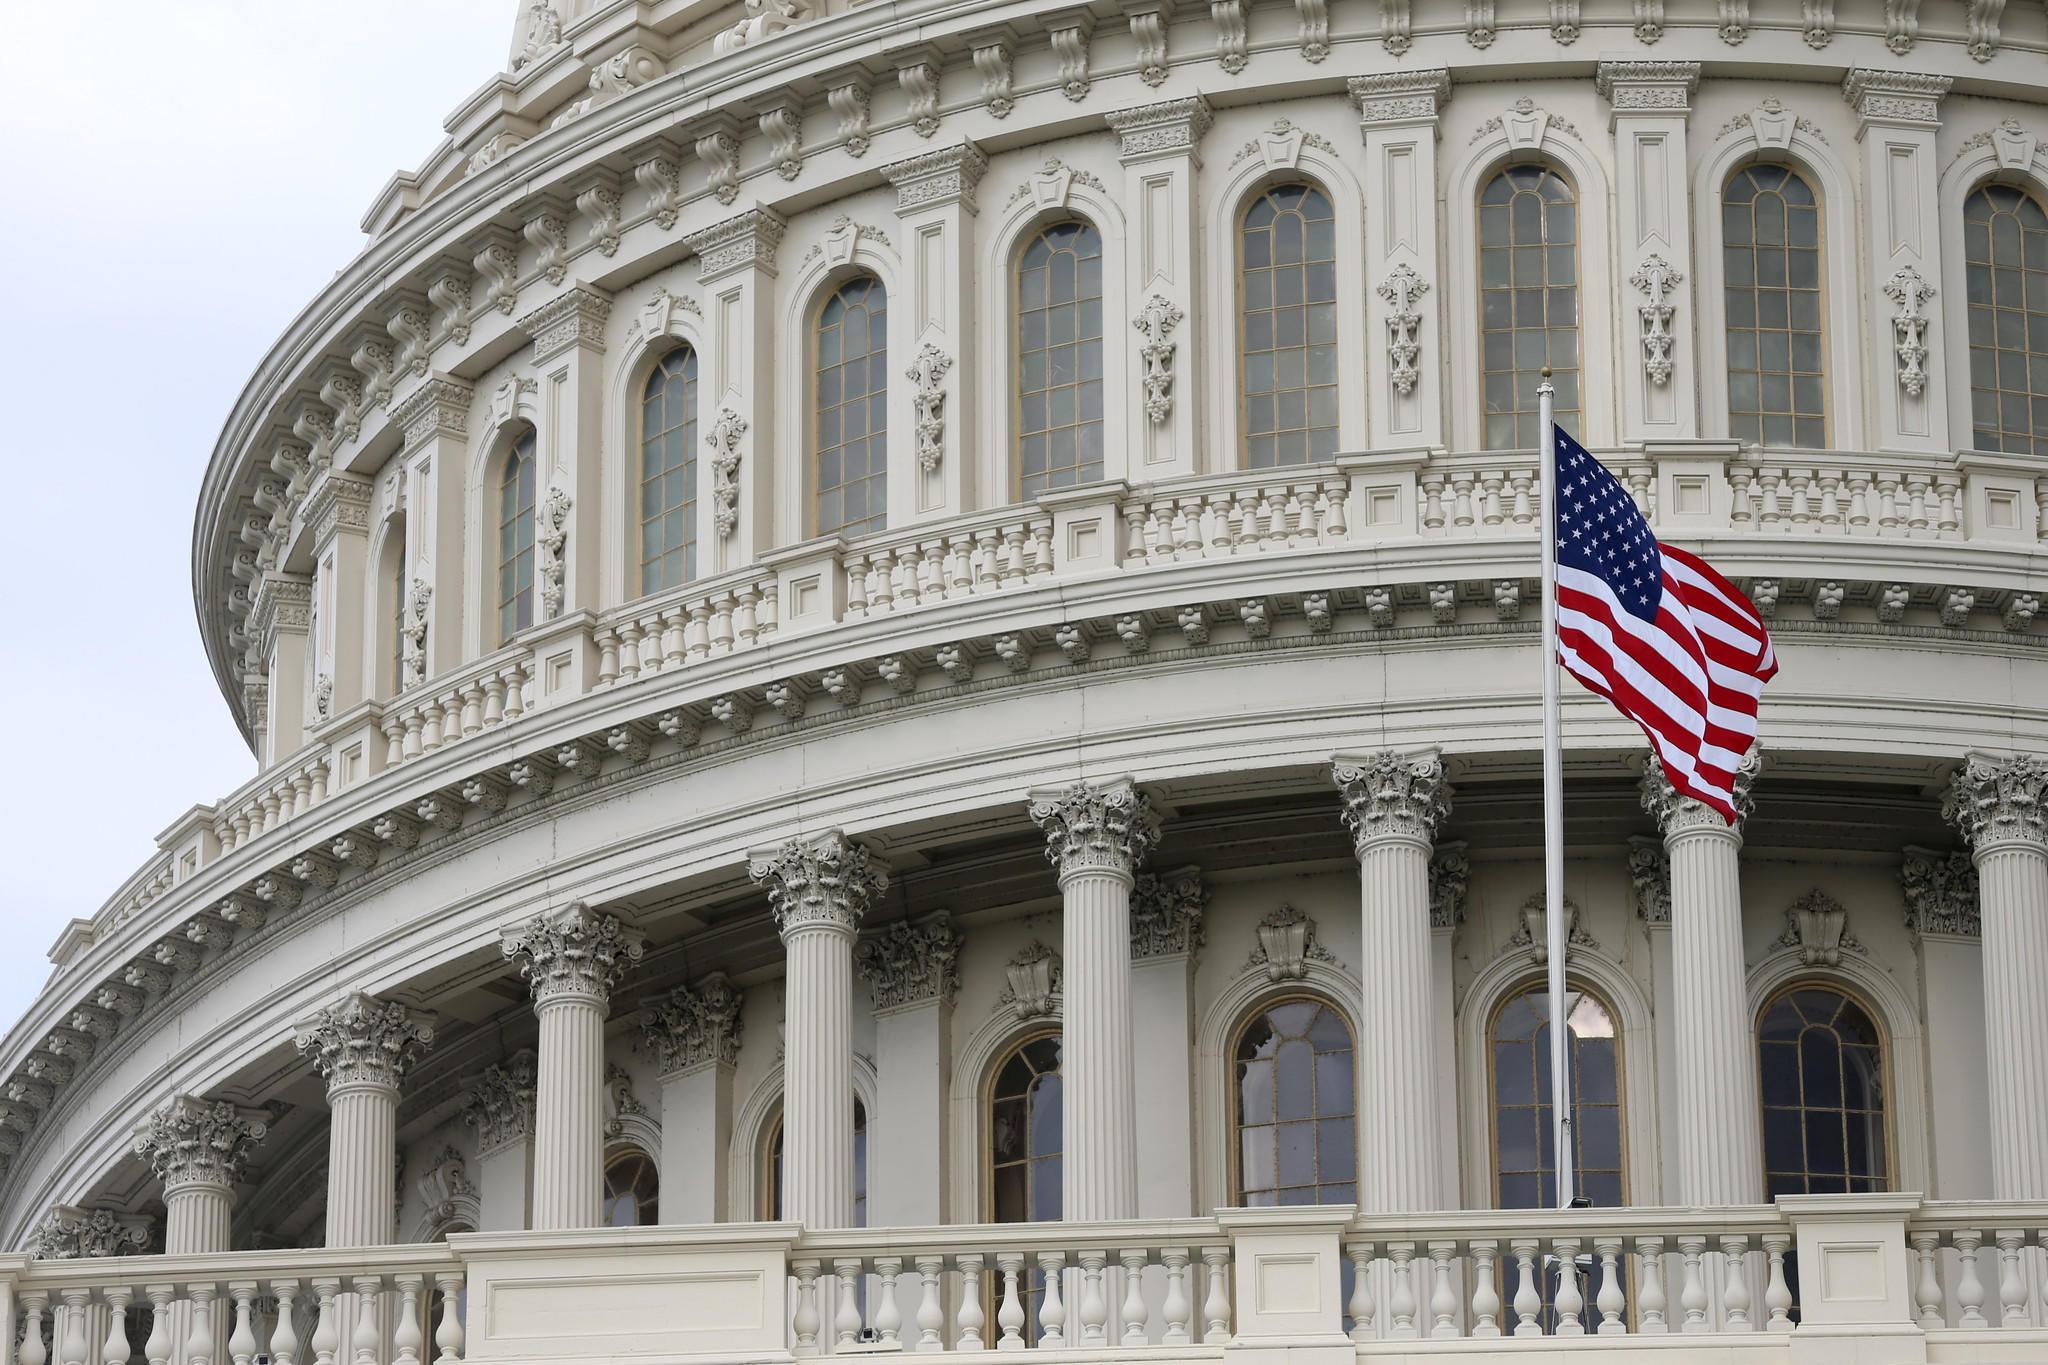 The U.S. Capitol on Aug. 13, 2013 in Washington.